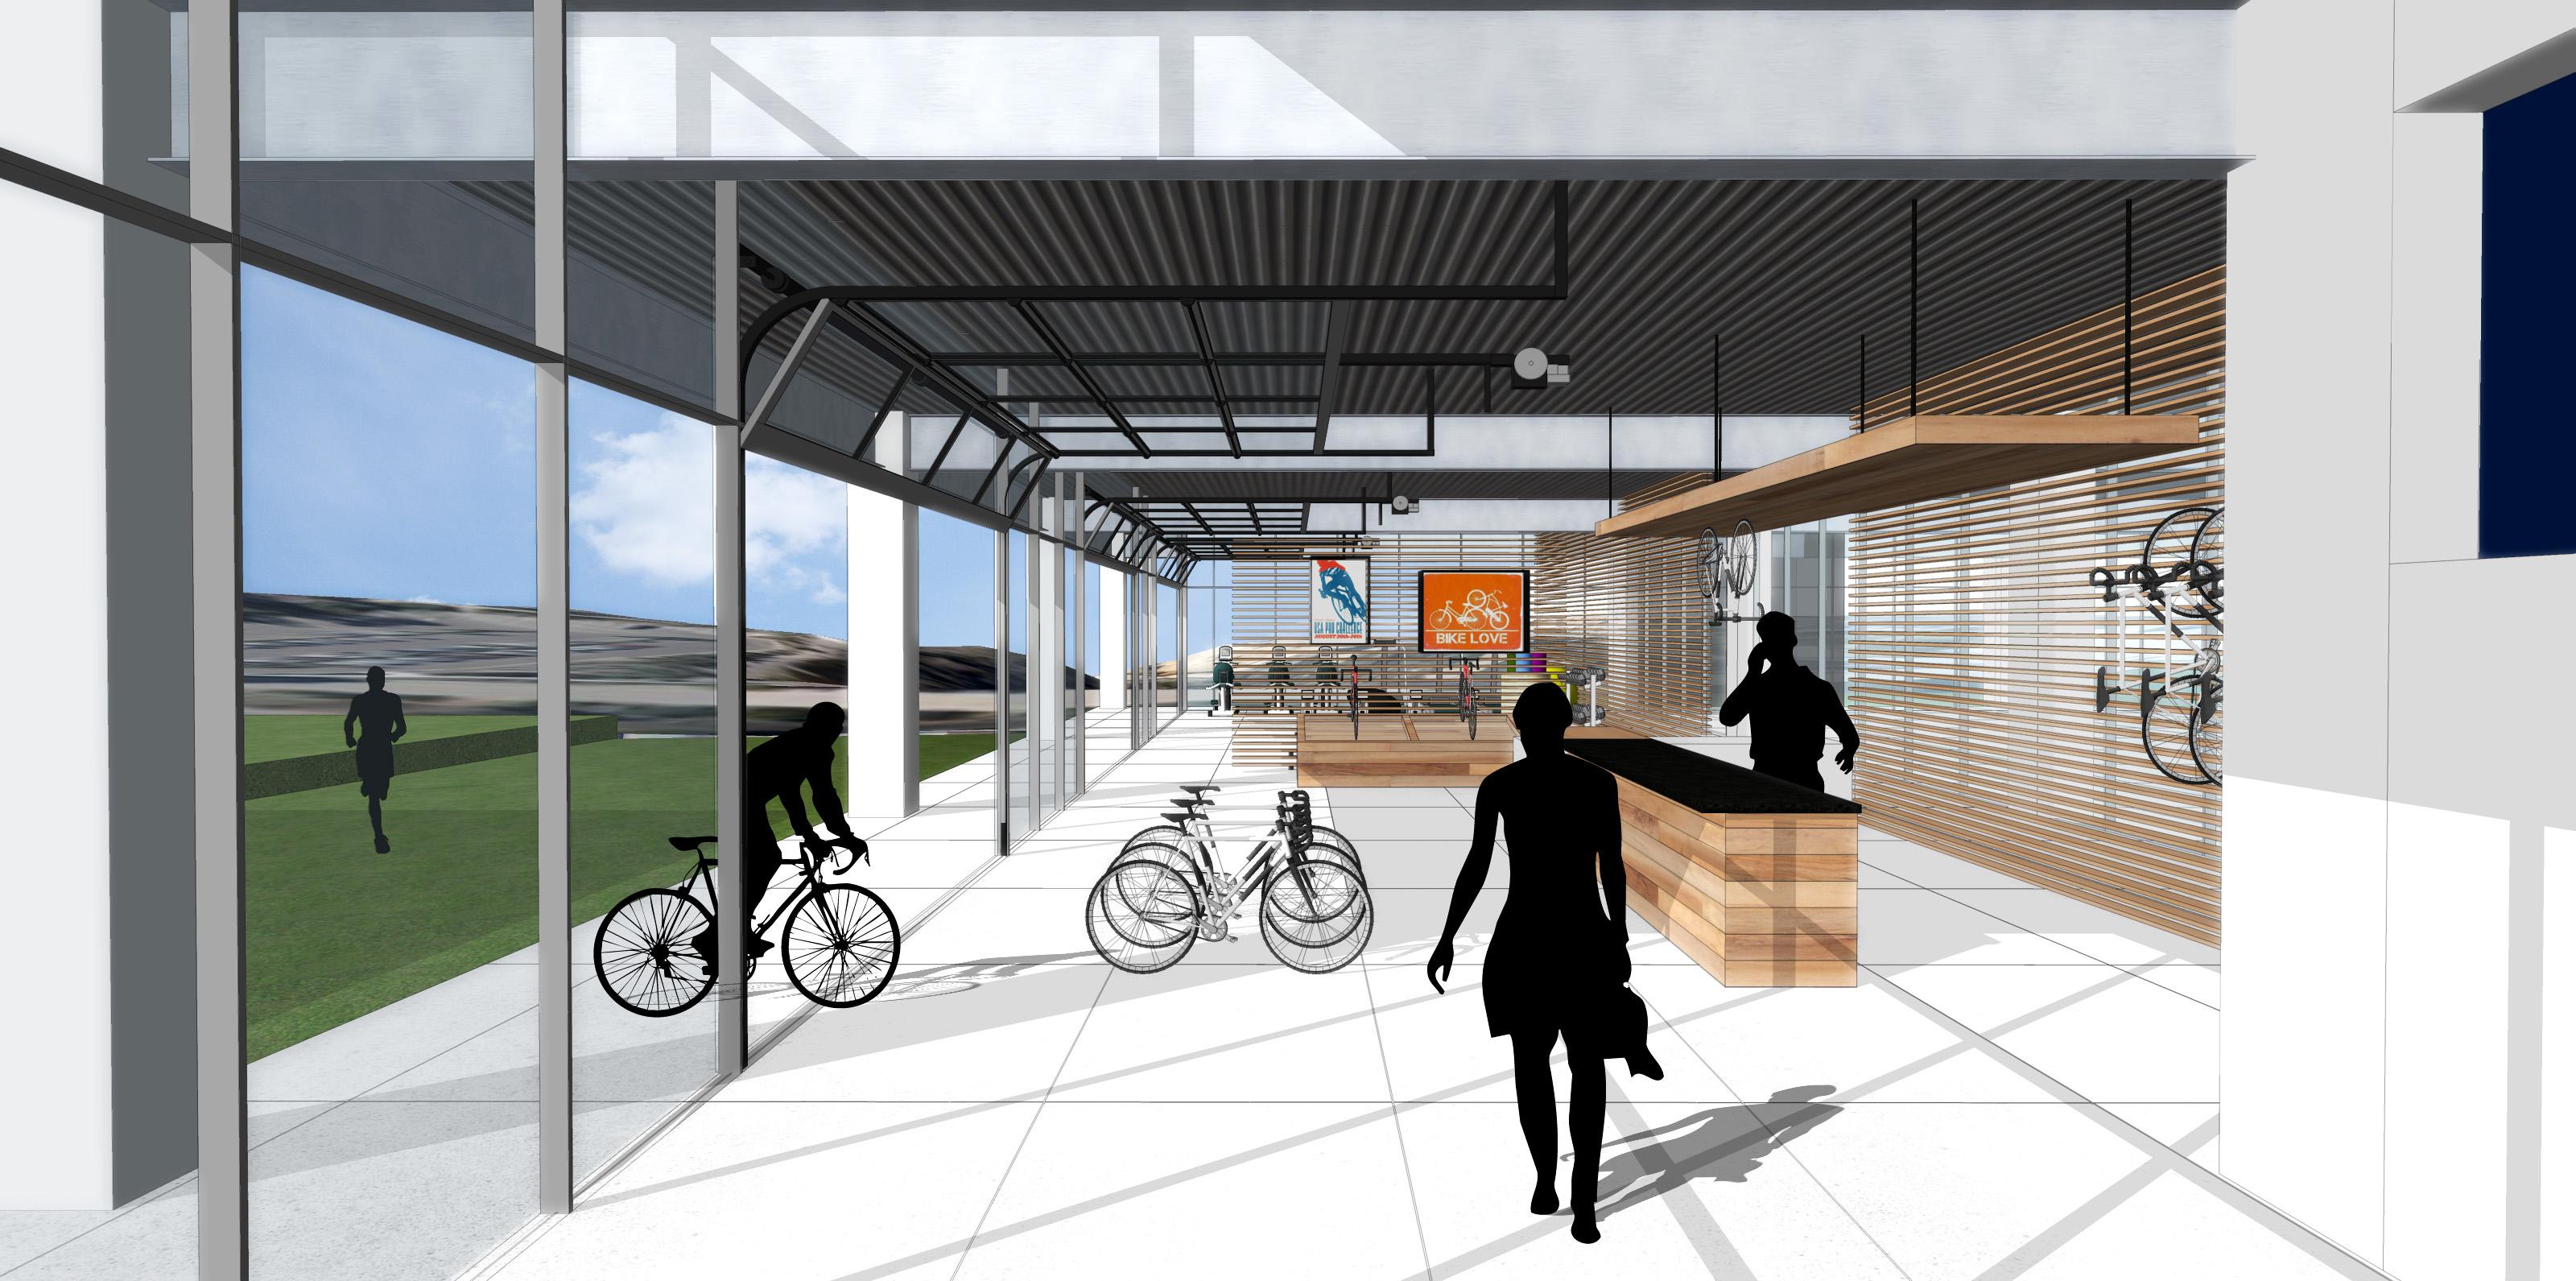 Bike Shop_Detail Model_gensler building_rendering